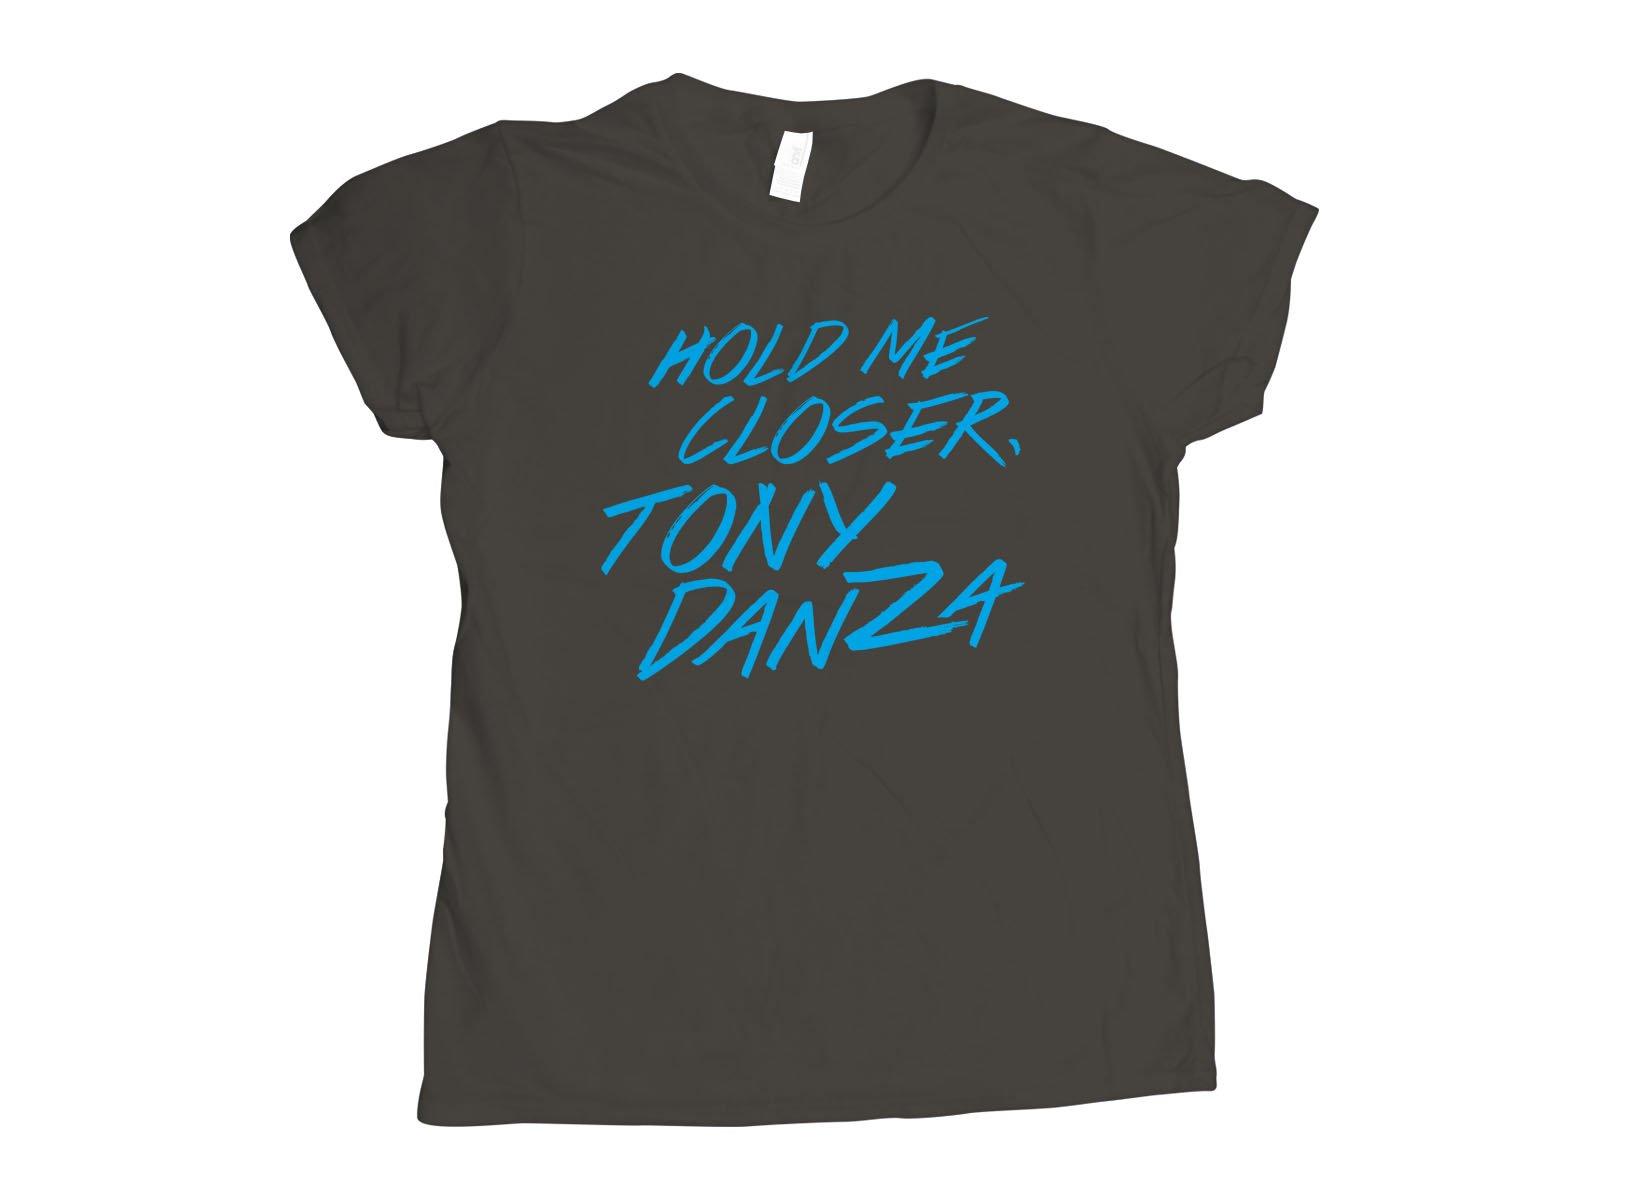 Hold Me Closer, Tony Danza on Womens T-Shirt